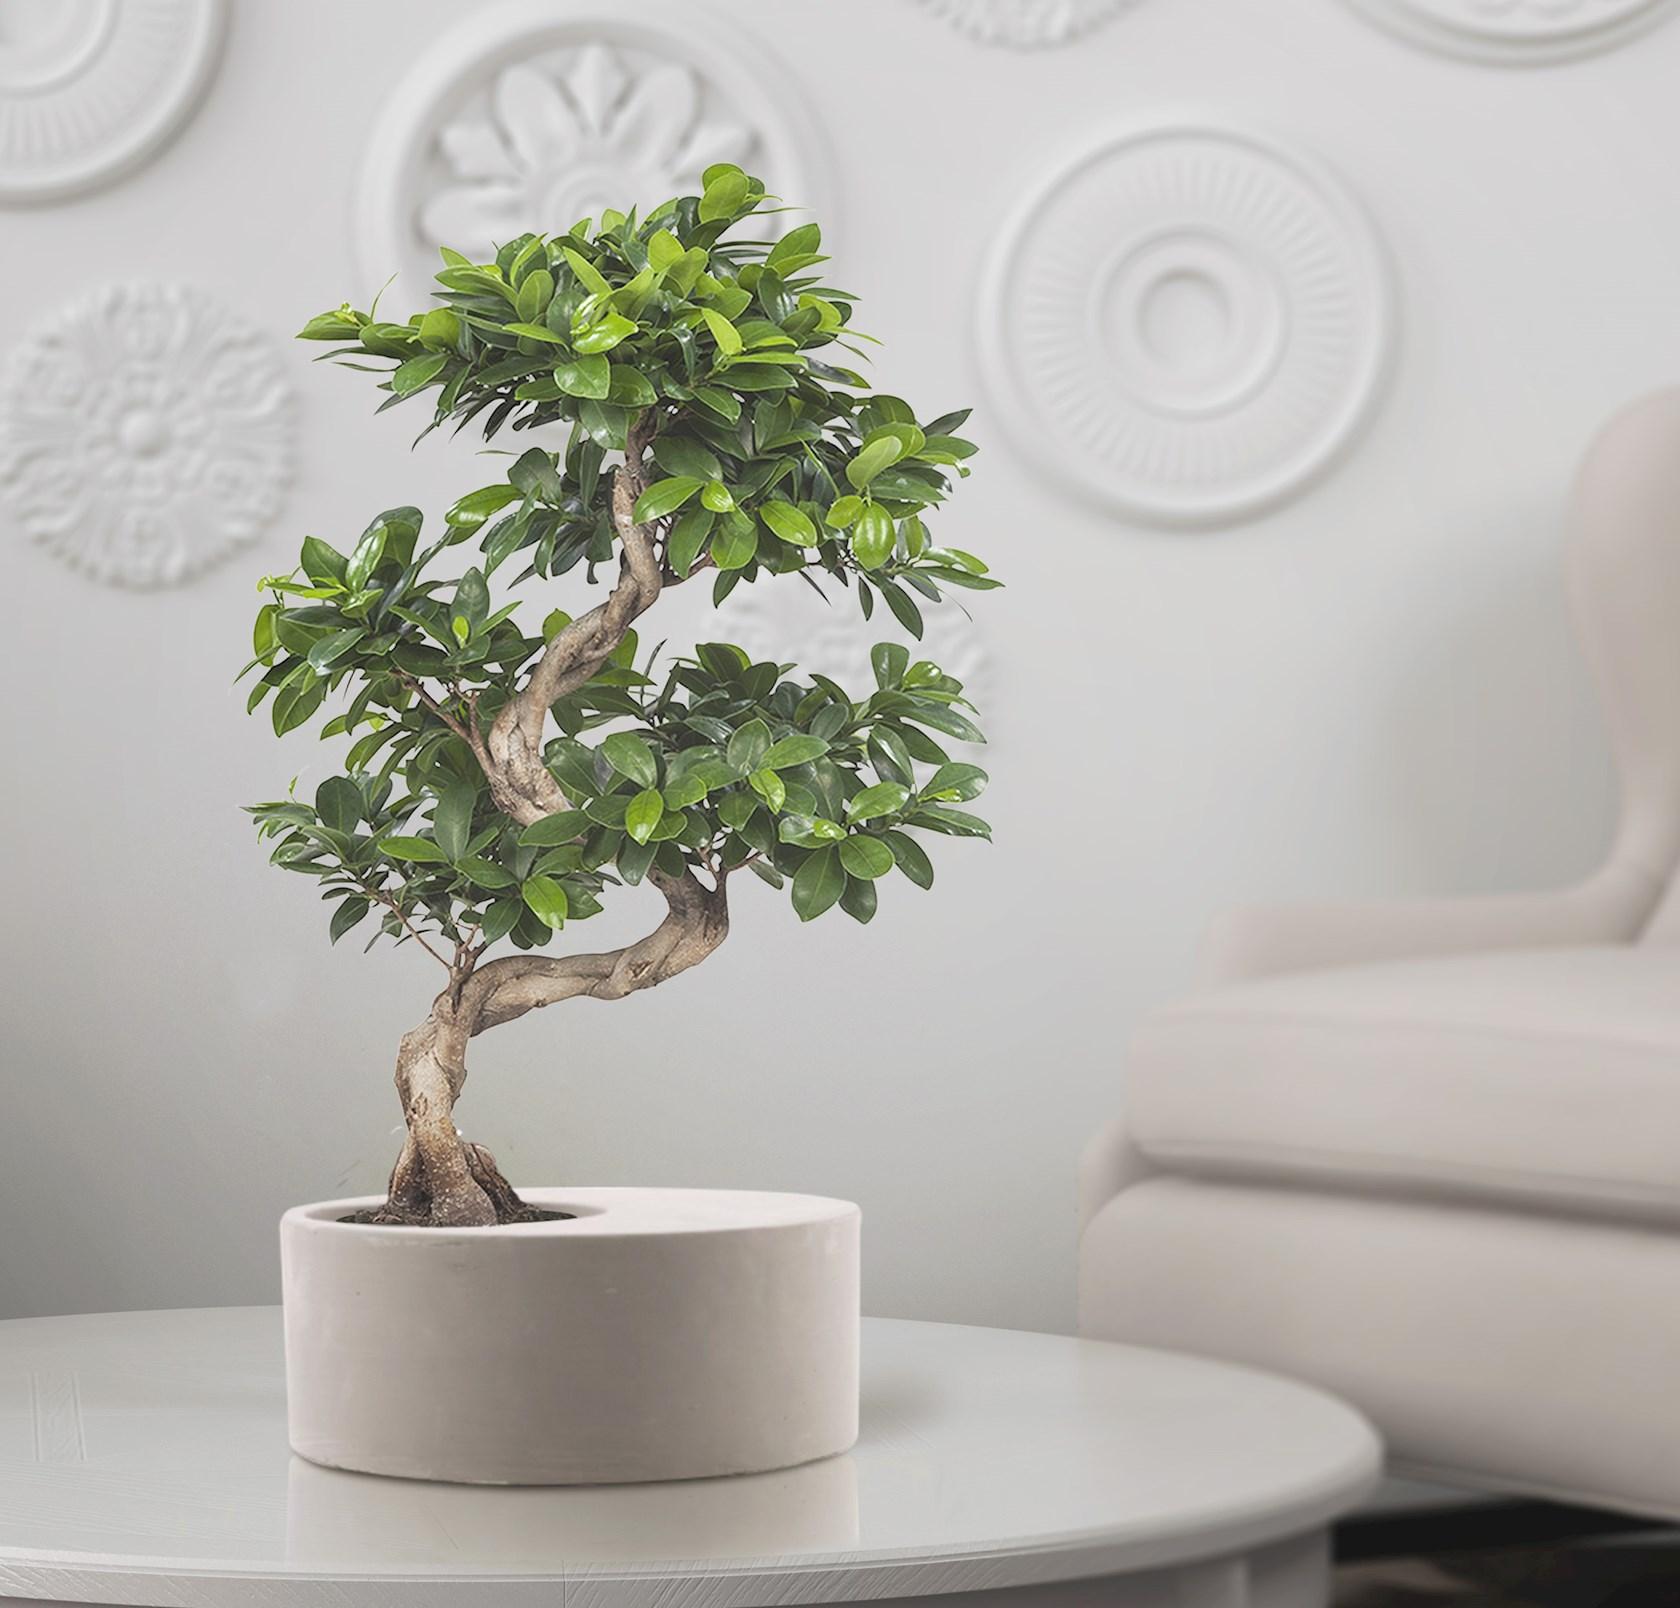 Rubberboom - Ficus Gin Seng Bonsai 70cm hoog